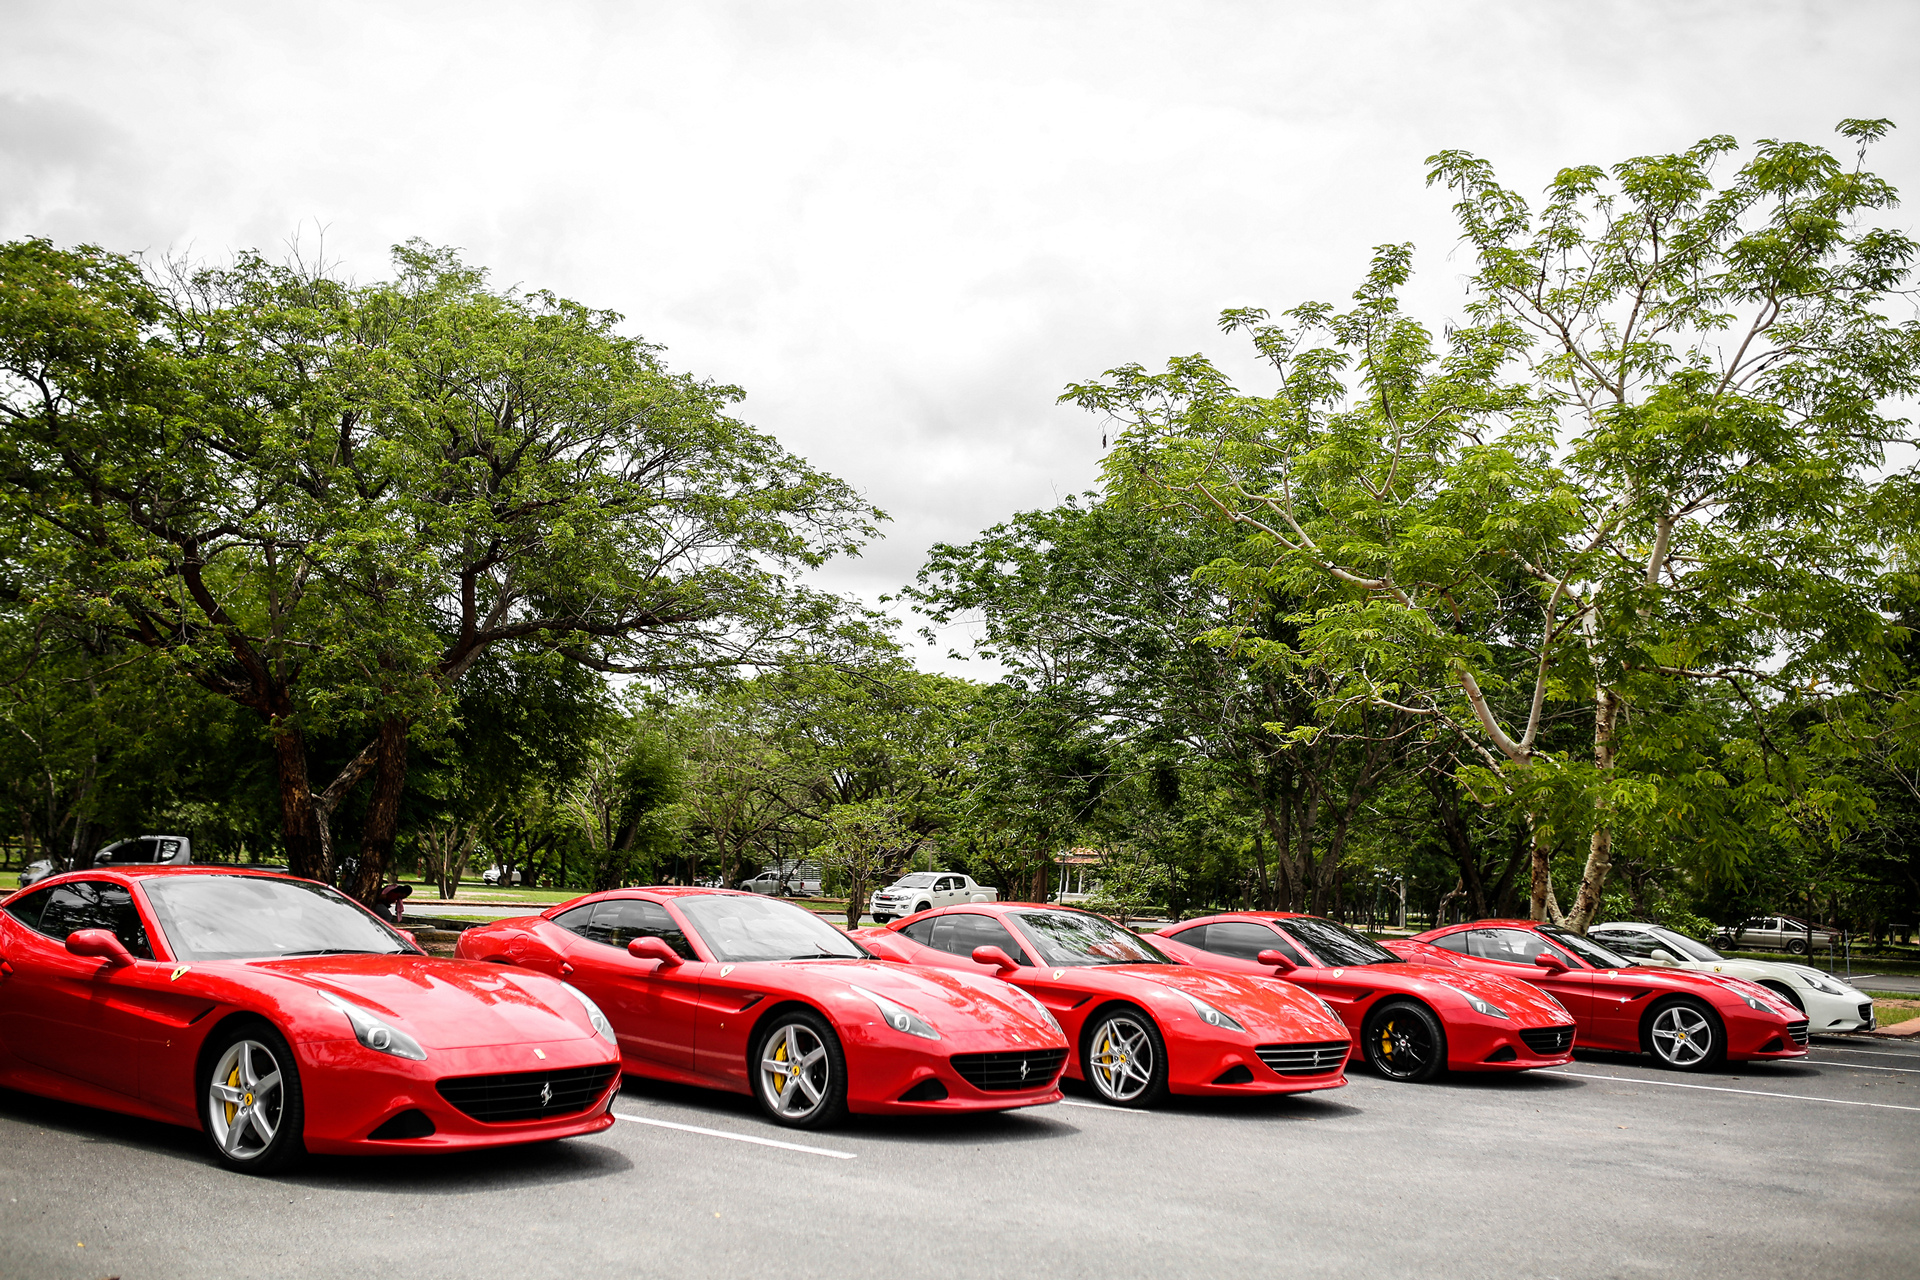 Ferrari California T Wows in Ayutthaya © Fiat Chrysler Automobiles N.V.